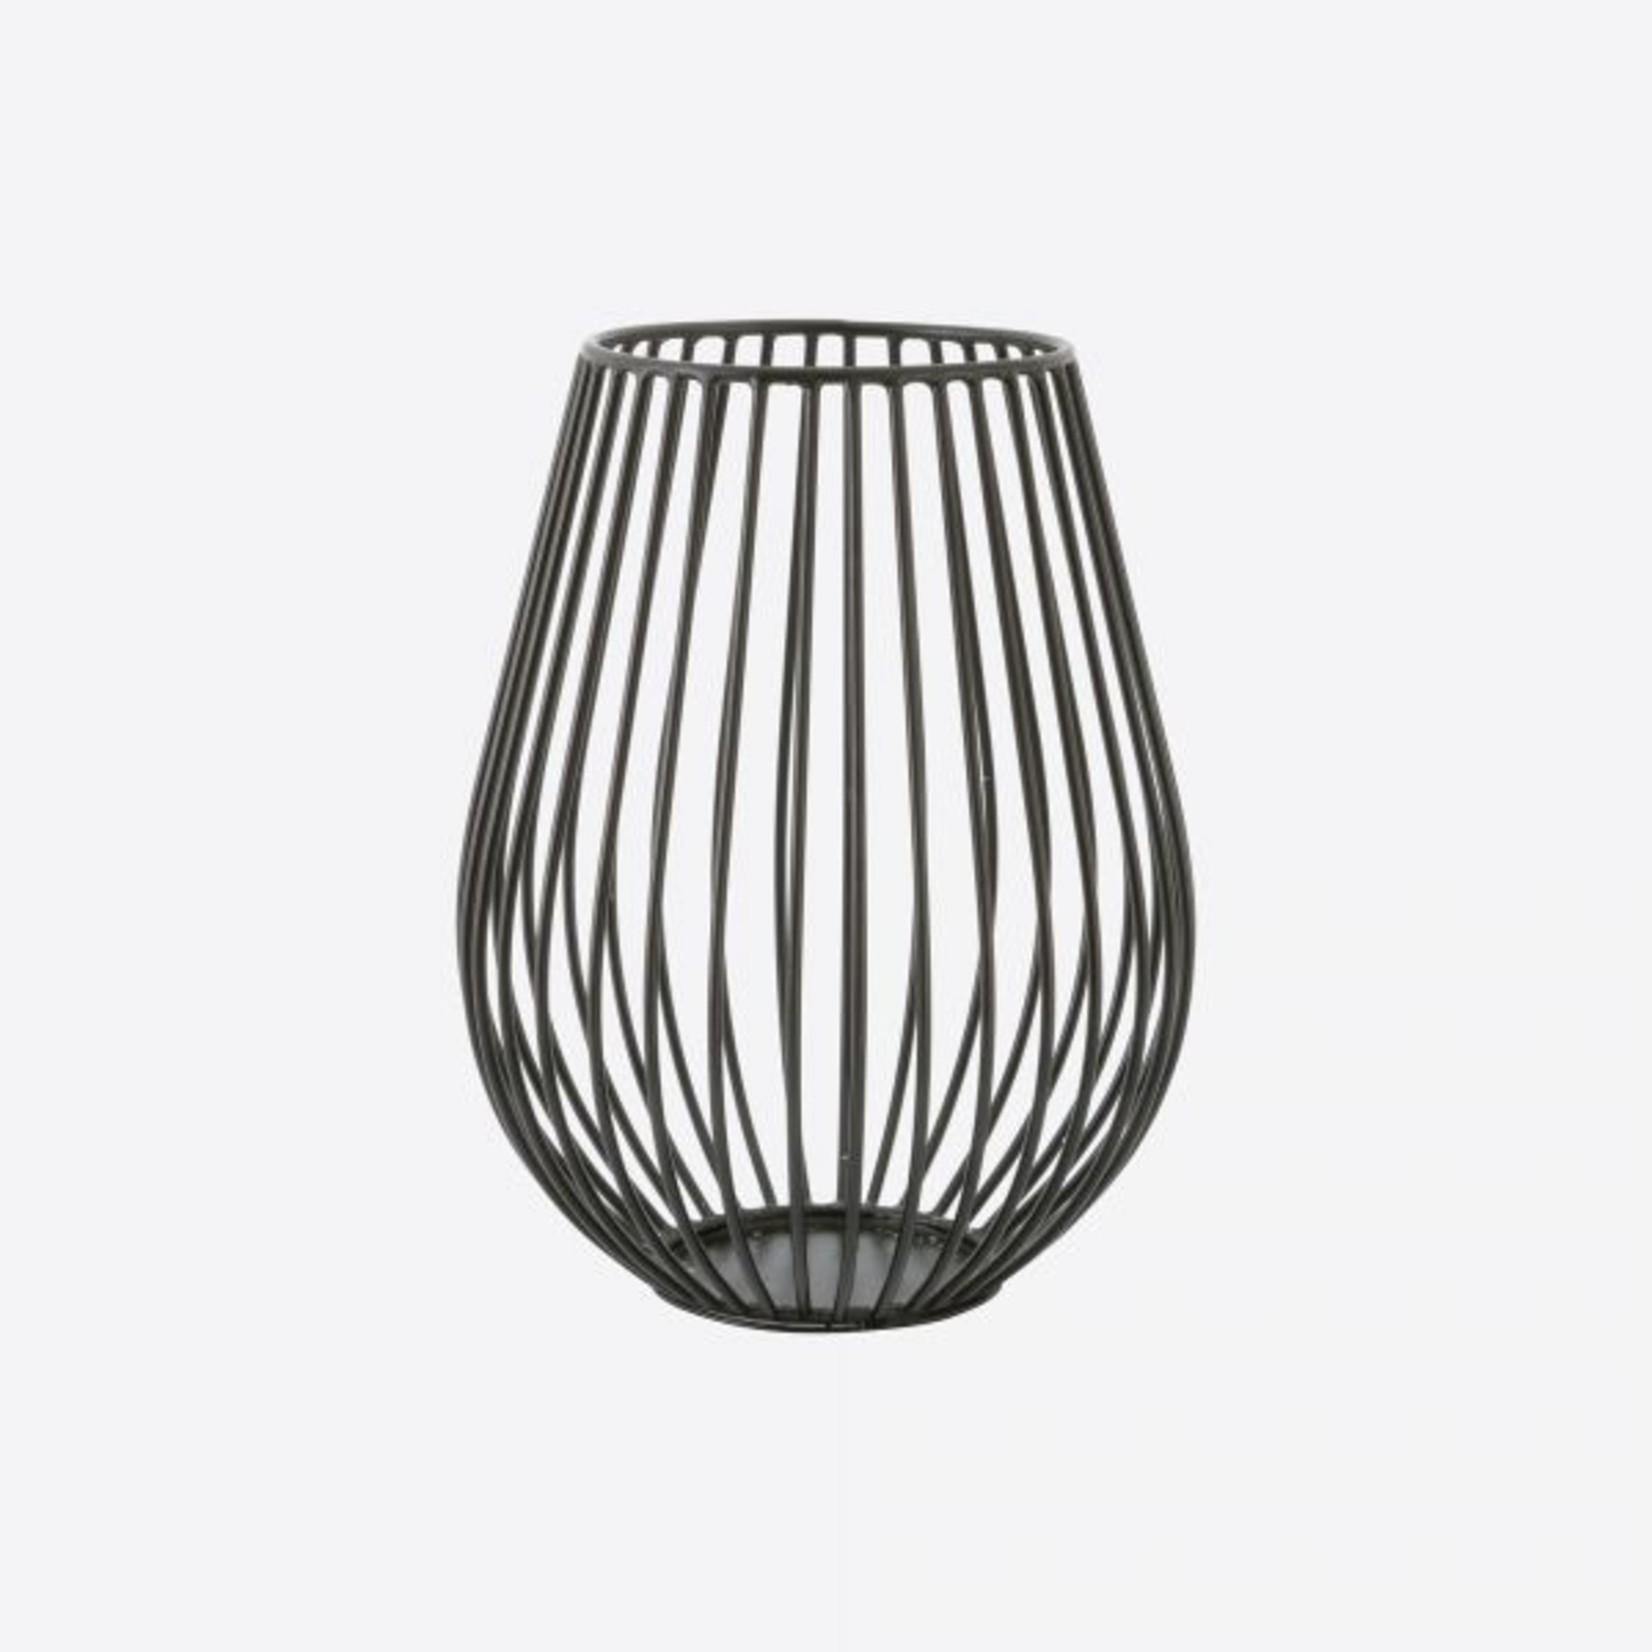 Point Virgule Kaarshouder - Wire - Zwart - Ø 11,5cm x 15,5cm